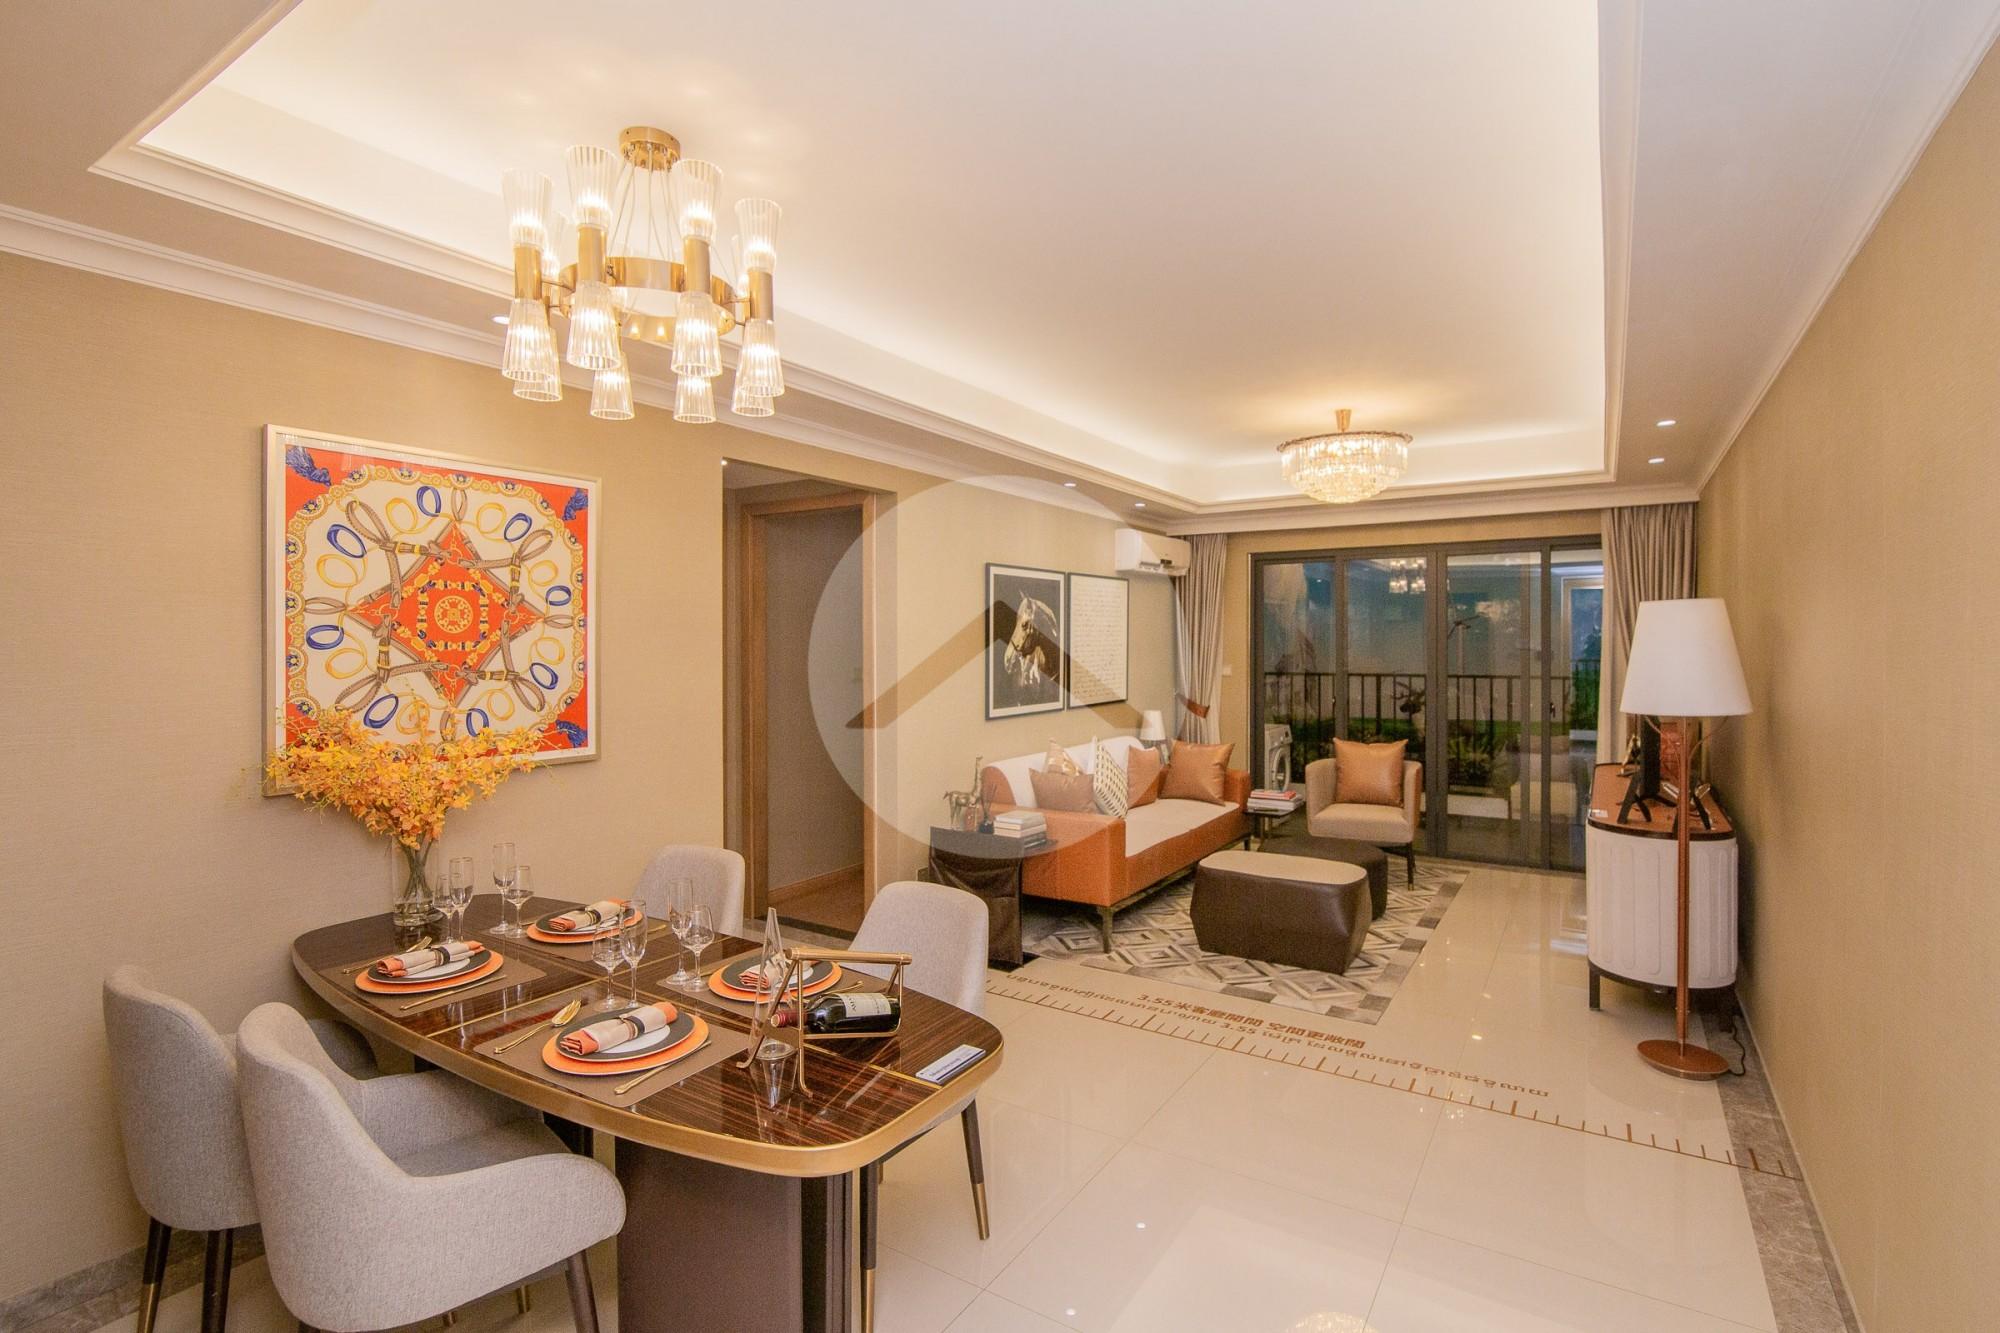 3 Bedroom Condominium For Sale - Hun Sen Blvd, Phnom Penh